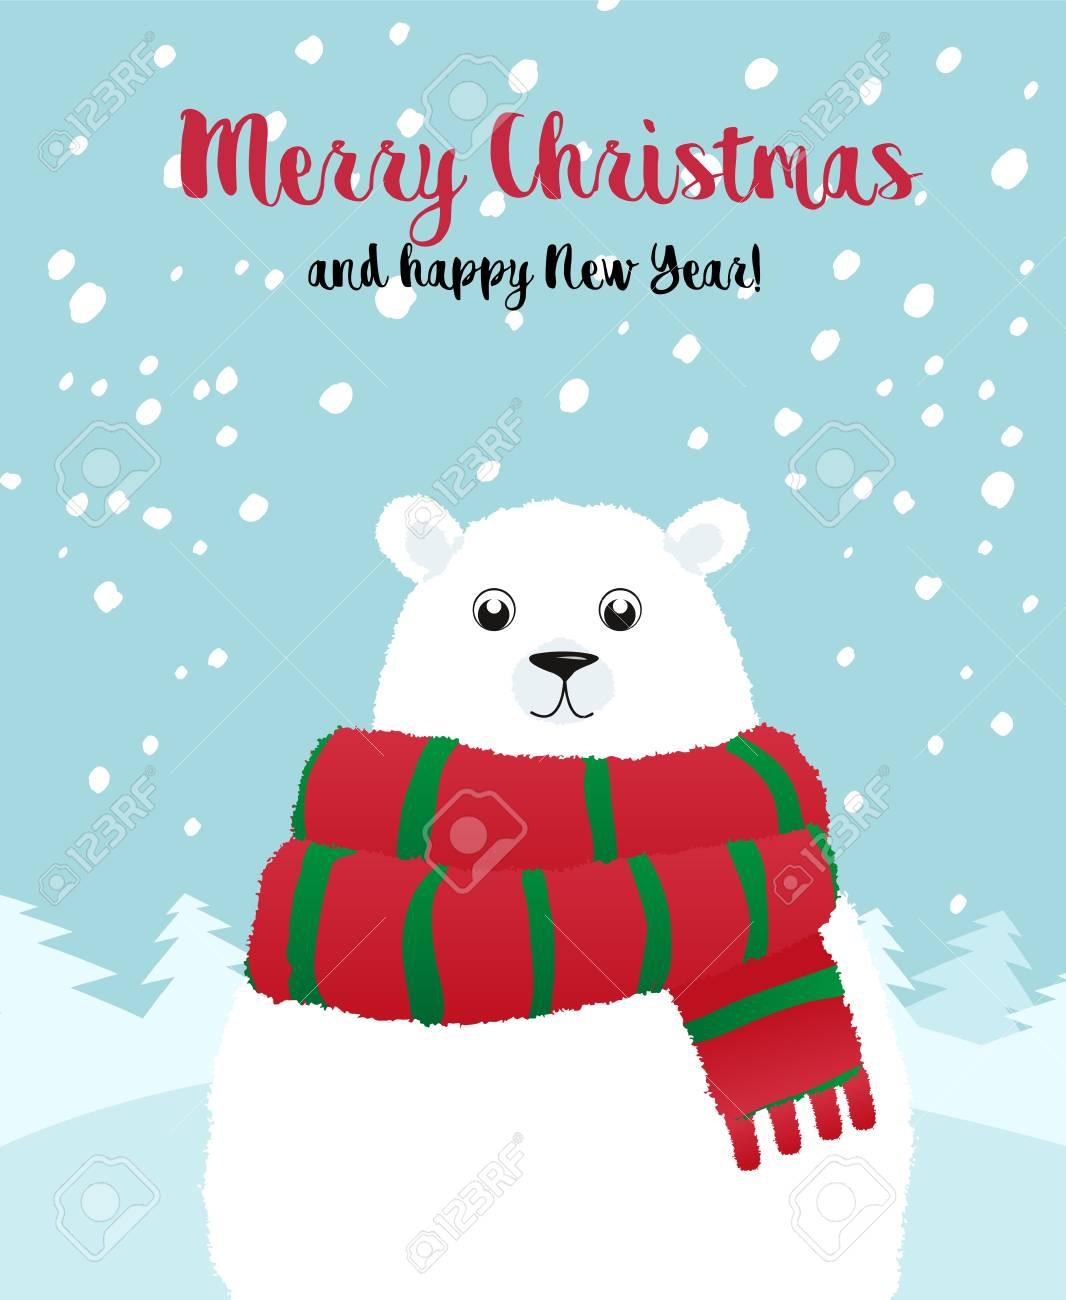 Christmas Holiday Card With A White Polar Bear. Merry Christmas ...